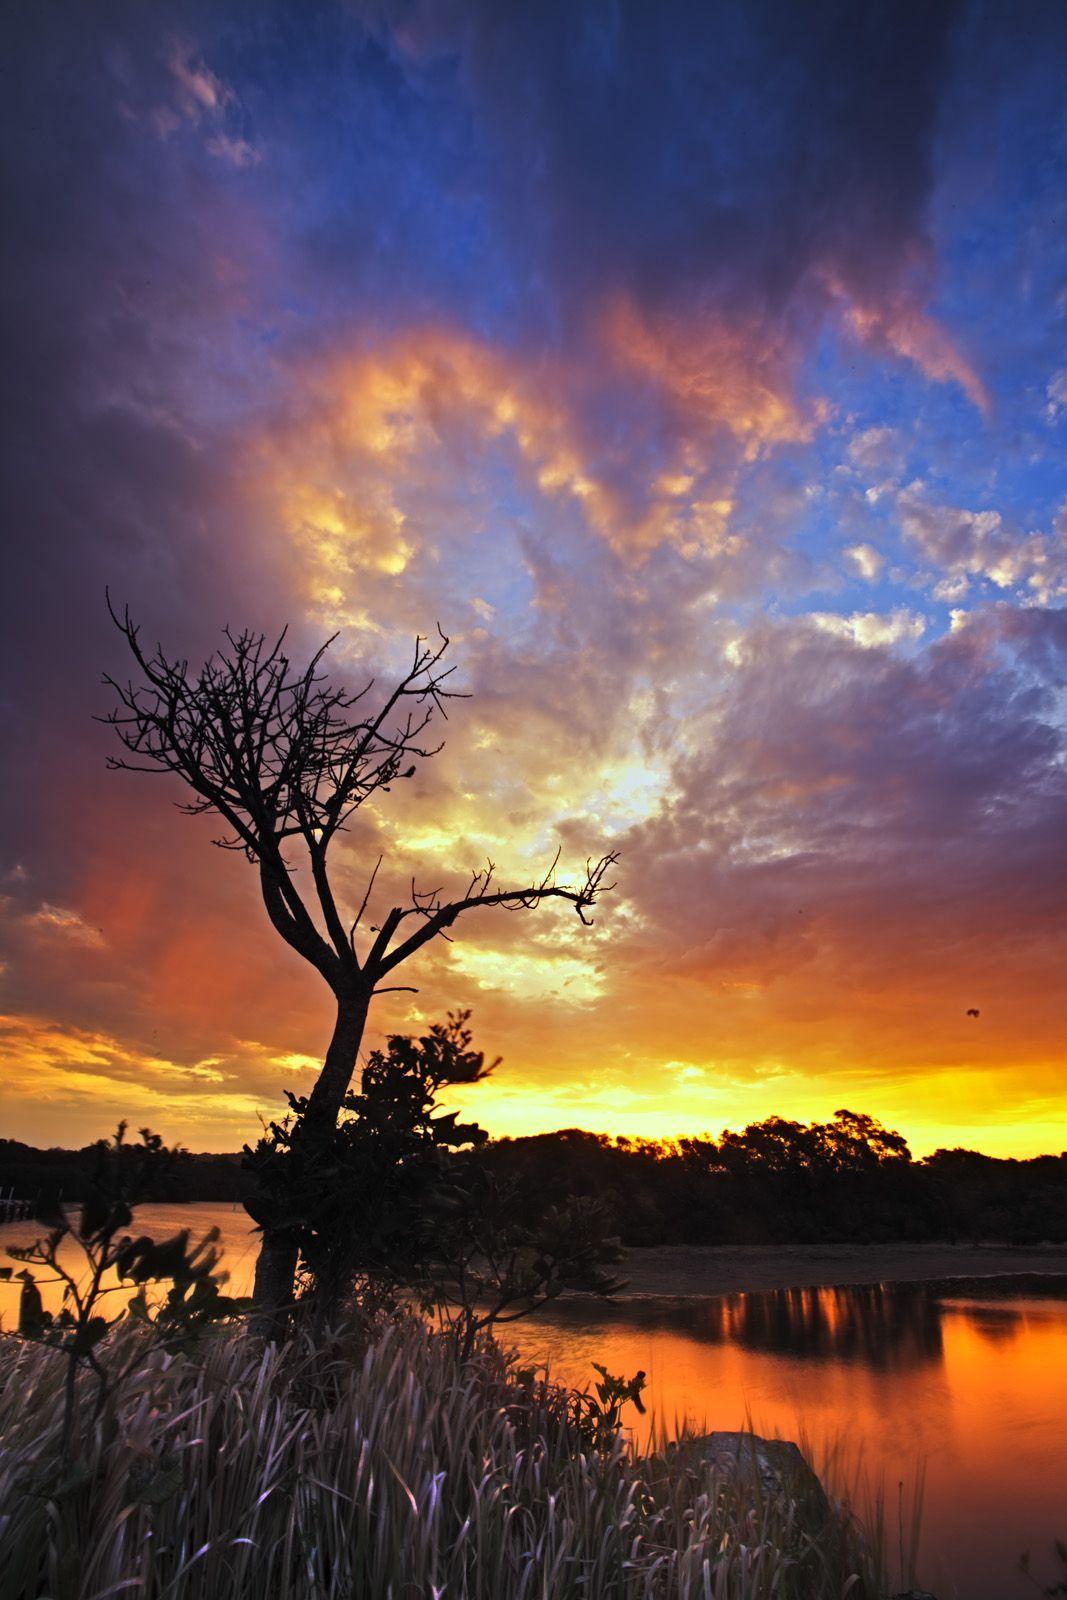 south west rocksaustralian landscape photography